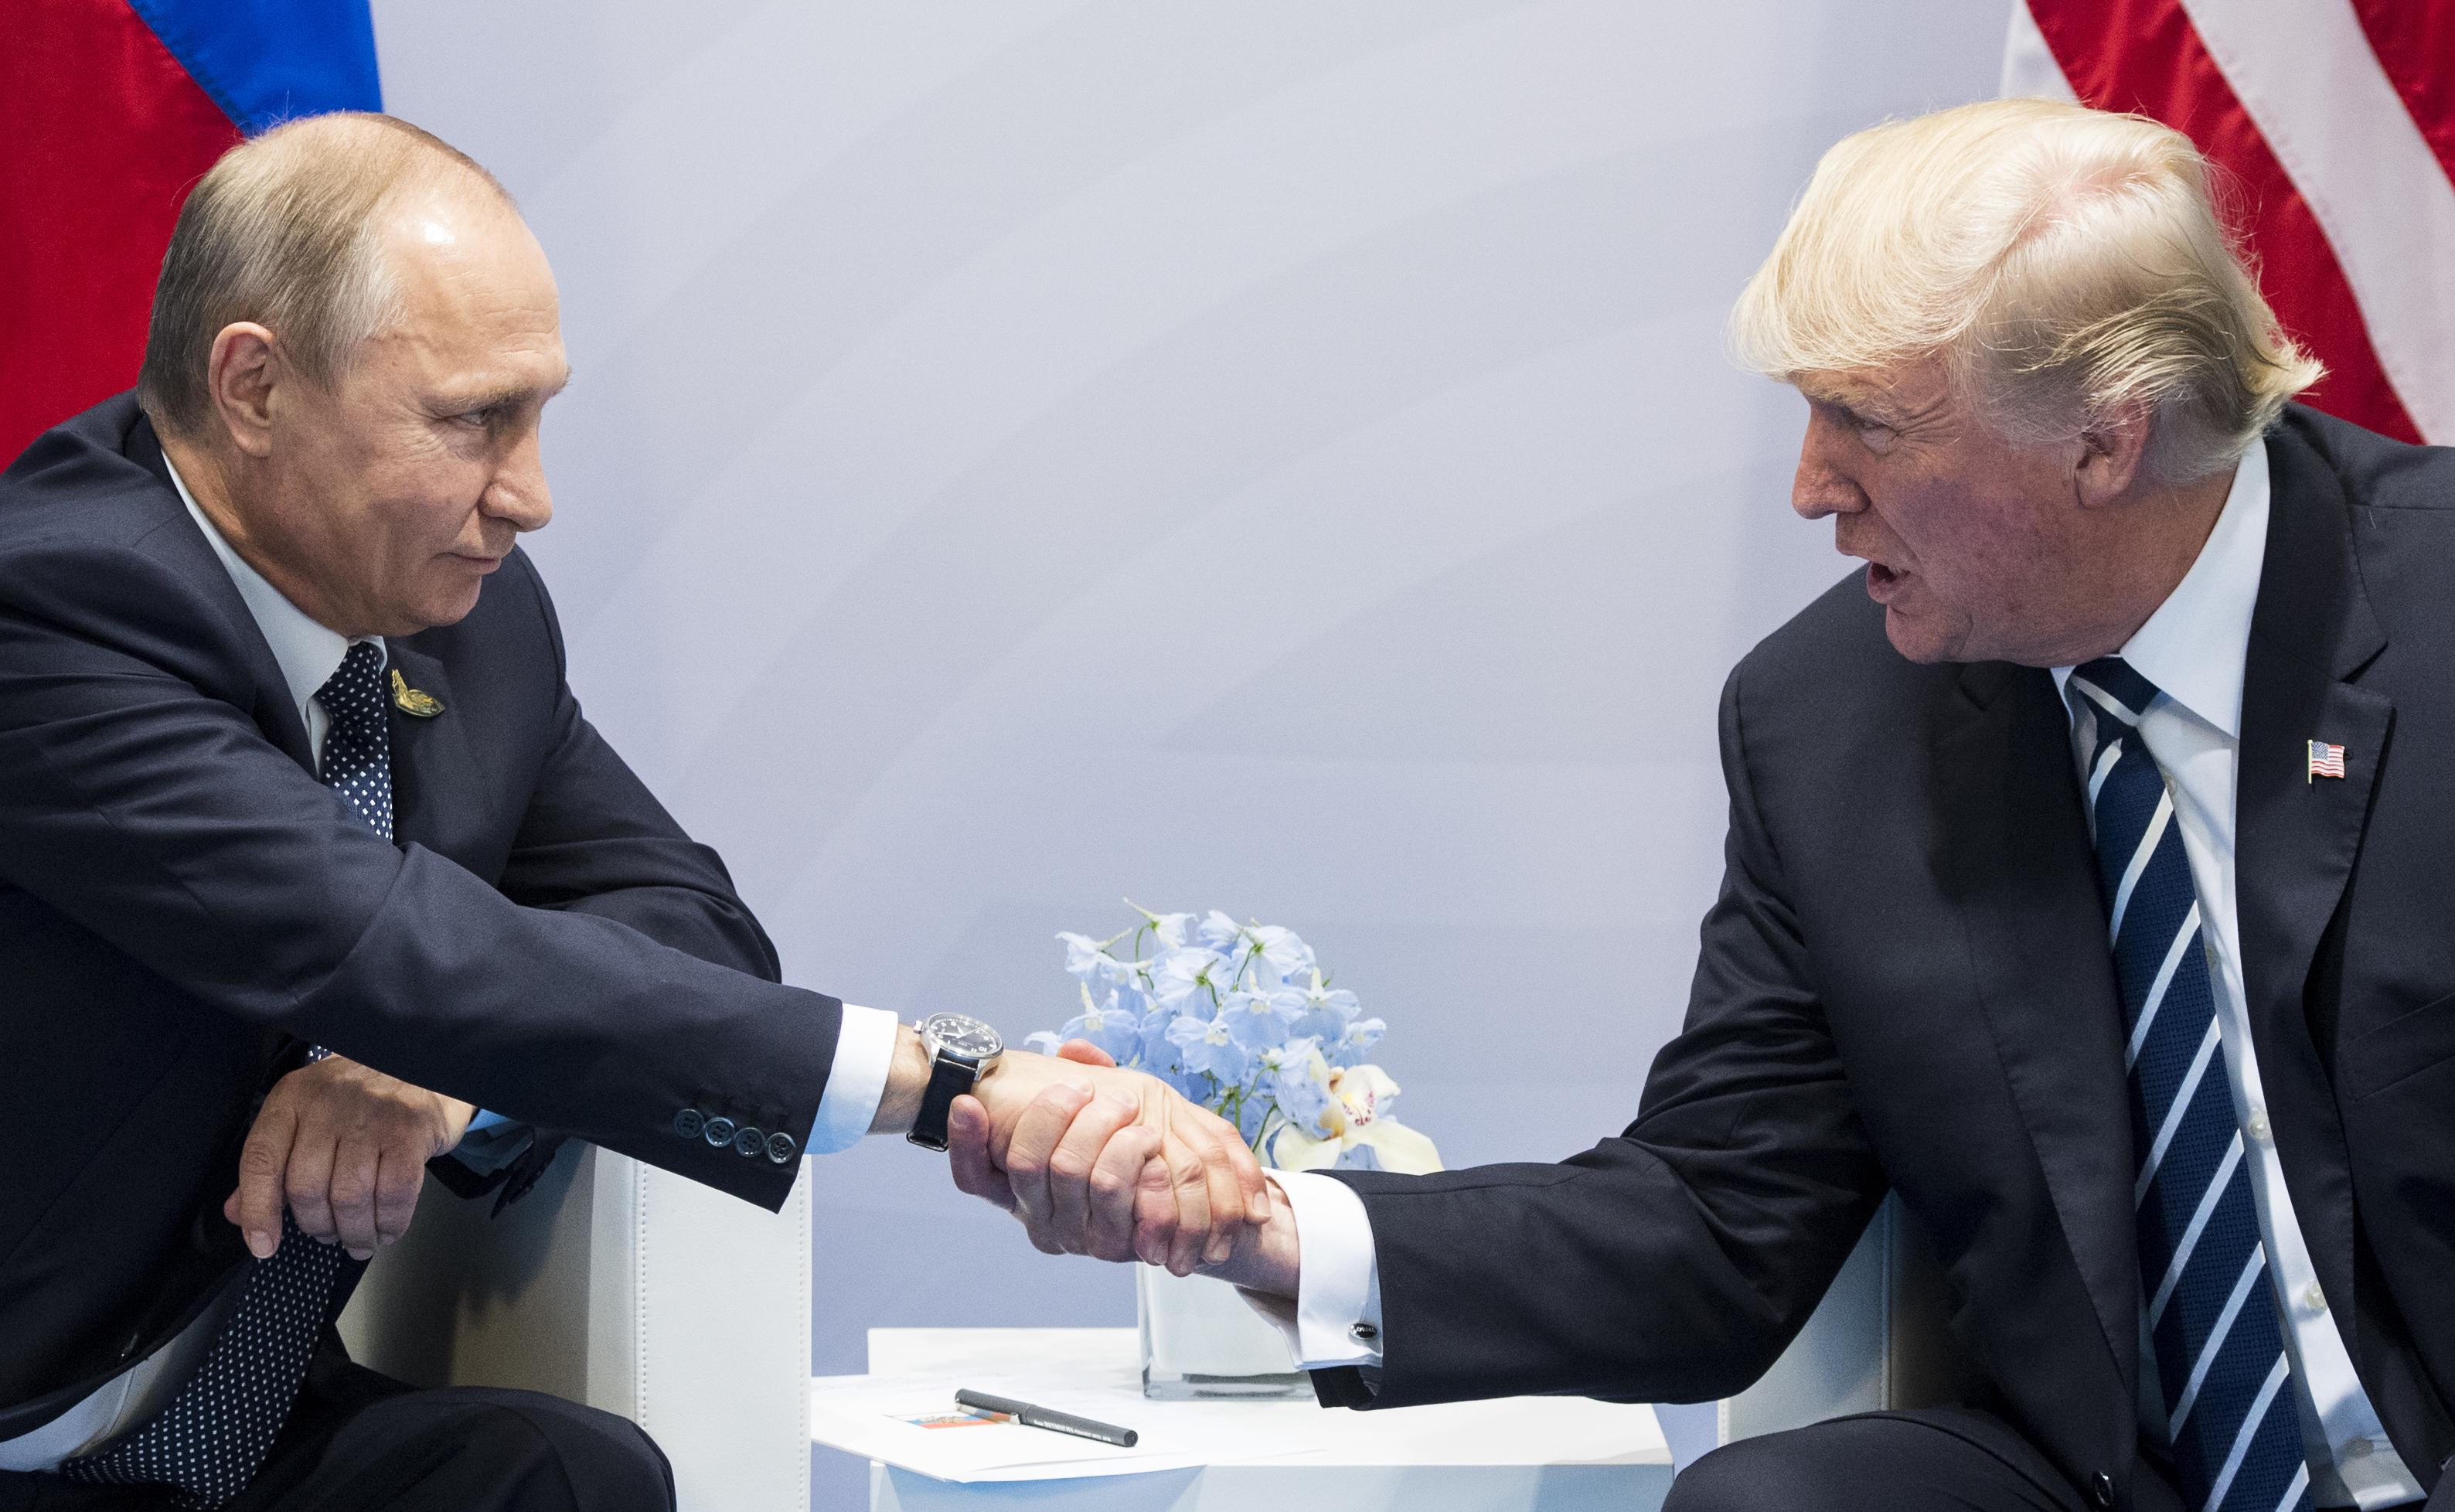 G20 Summit Donald Trump Vladimir Putin Have First Meeting Time